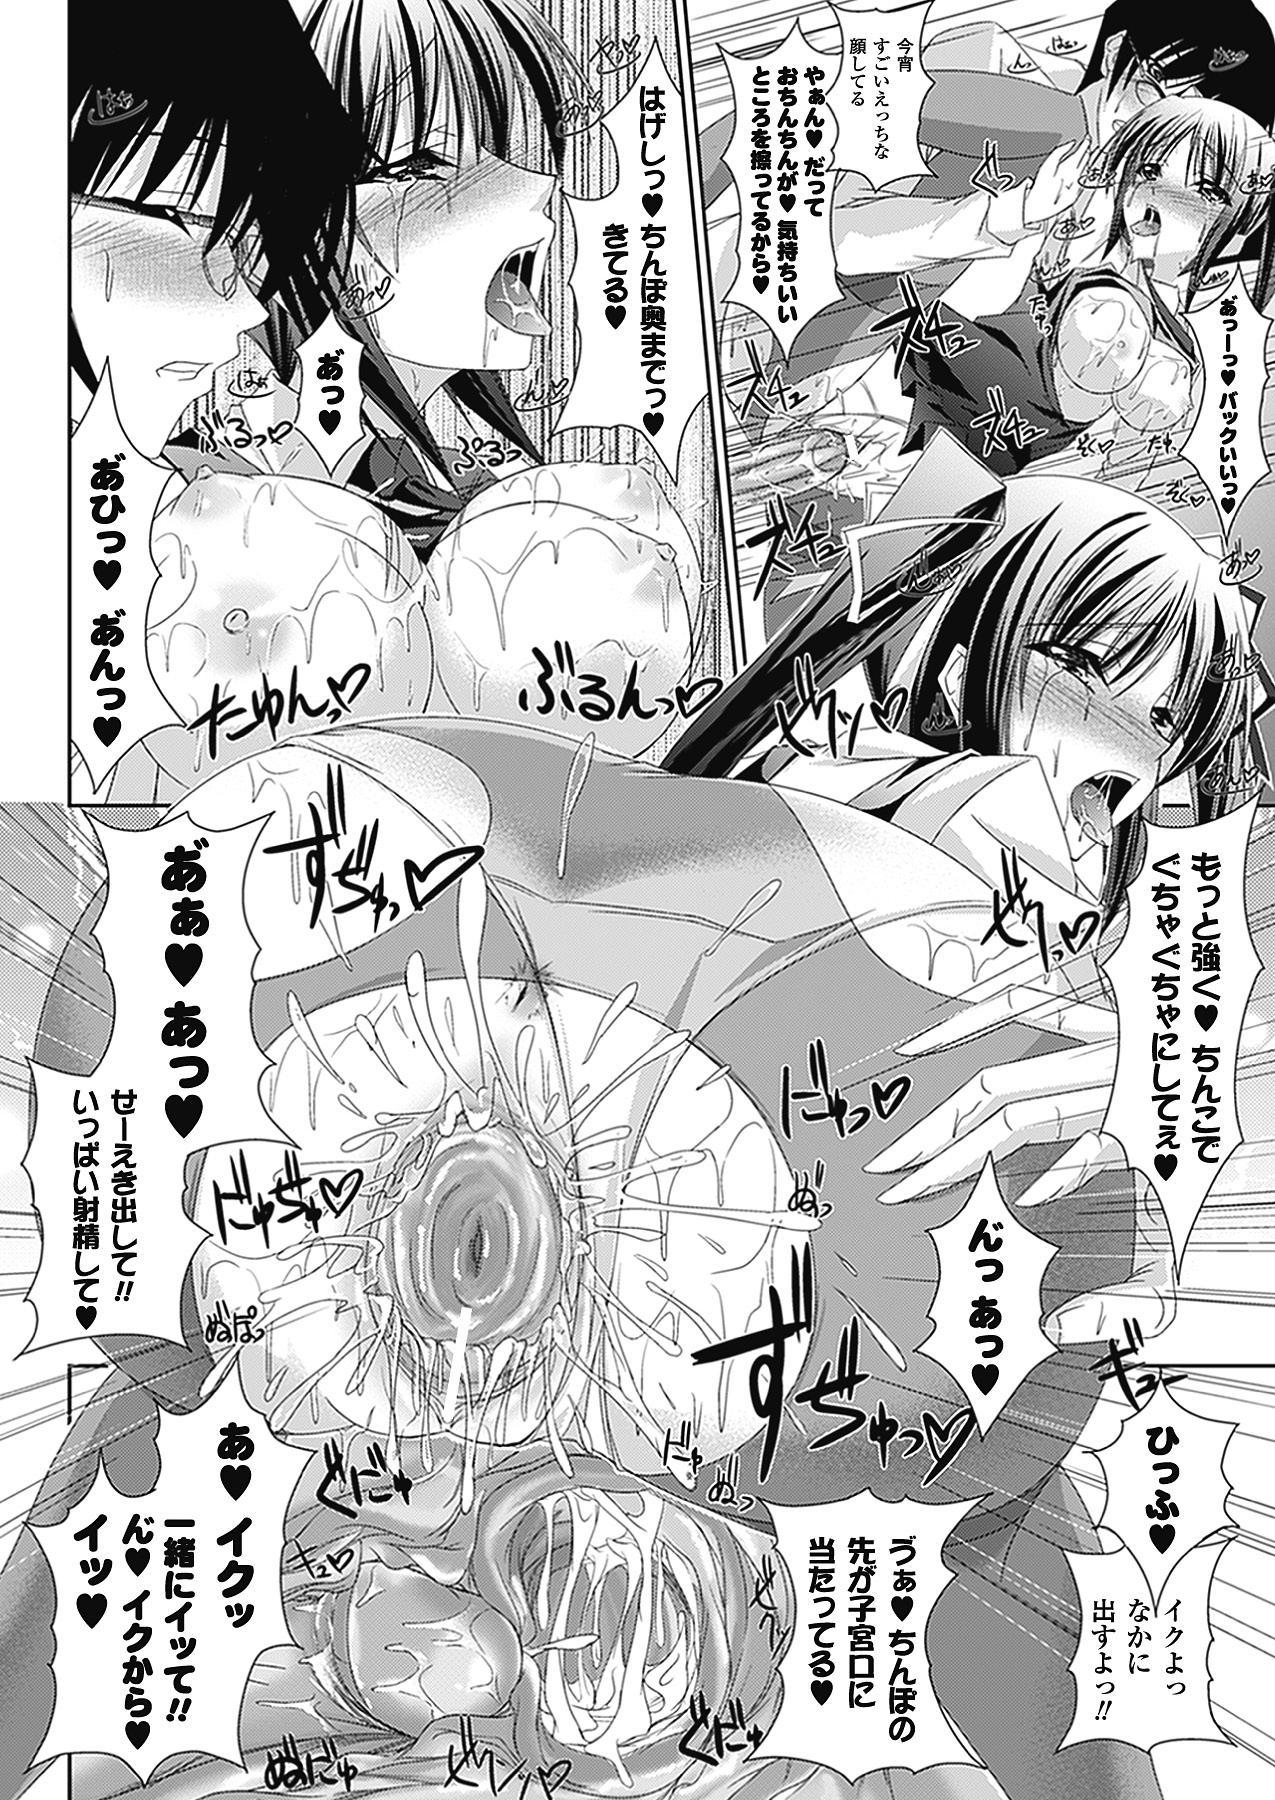 Amai Kuchibiru Torokeru Kuchibiru 149